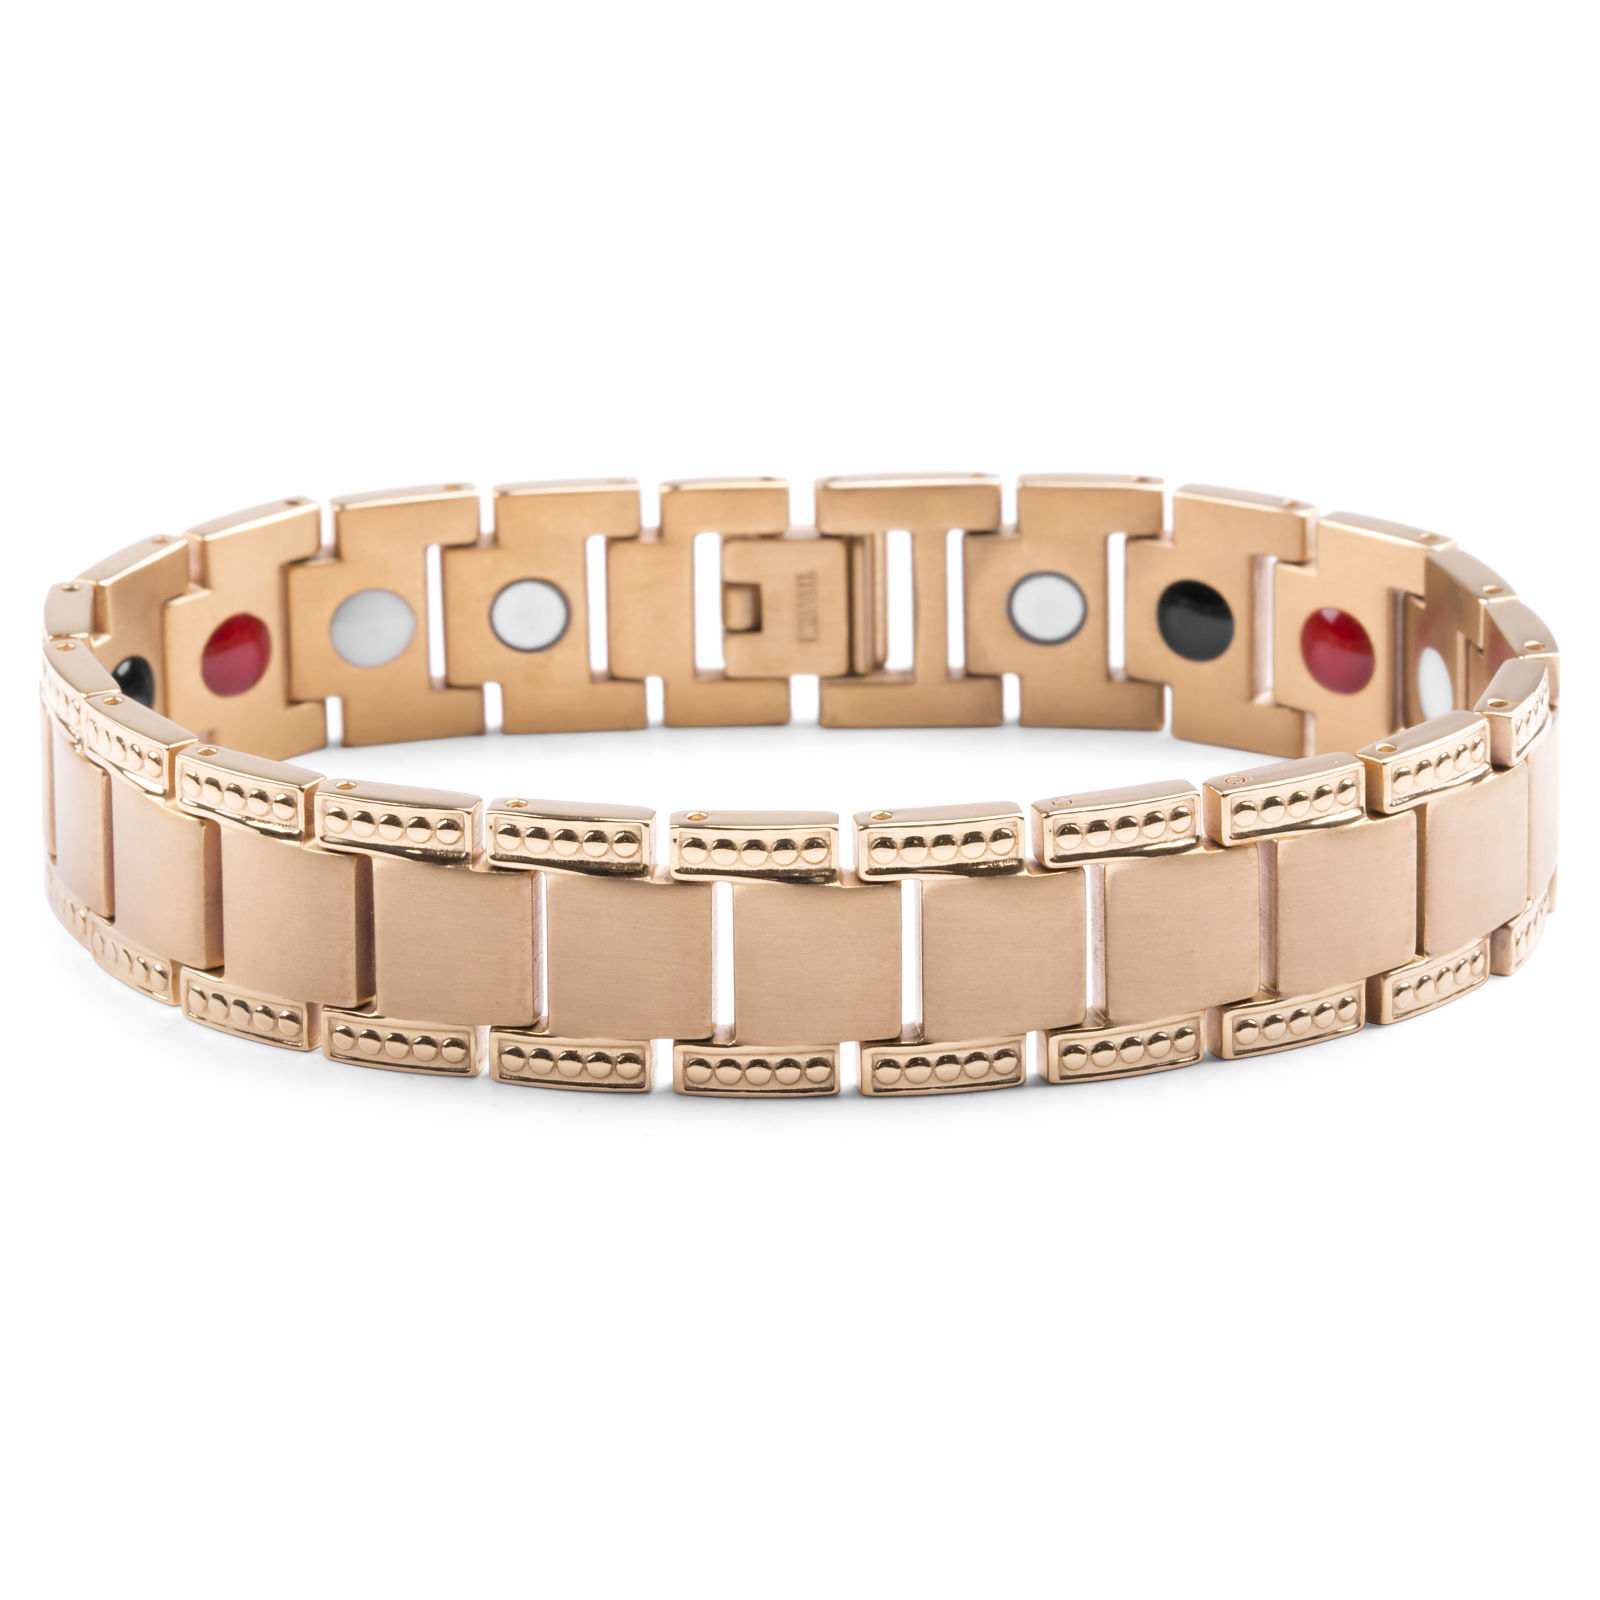 Gold Healing Titanium Steel Bracelet Trendhim